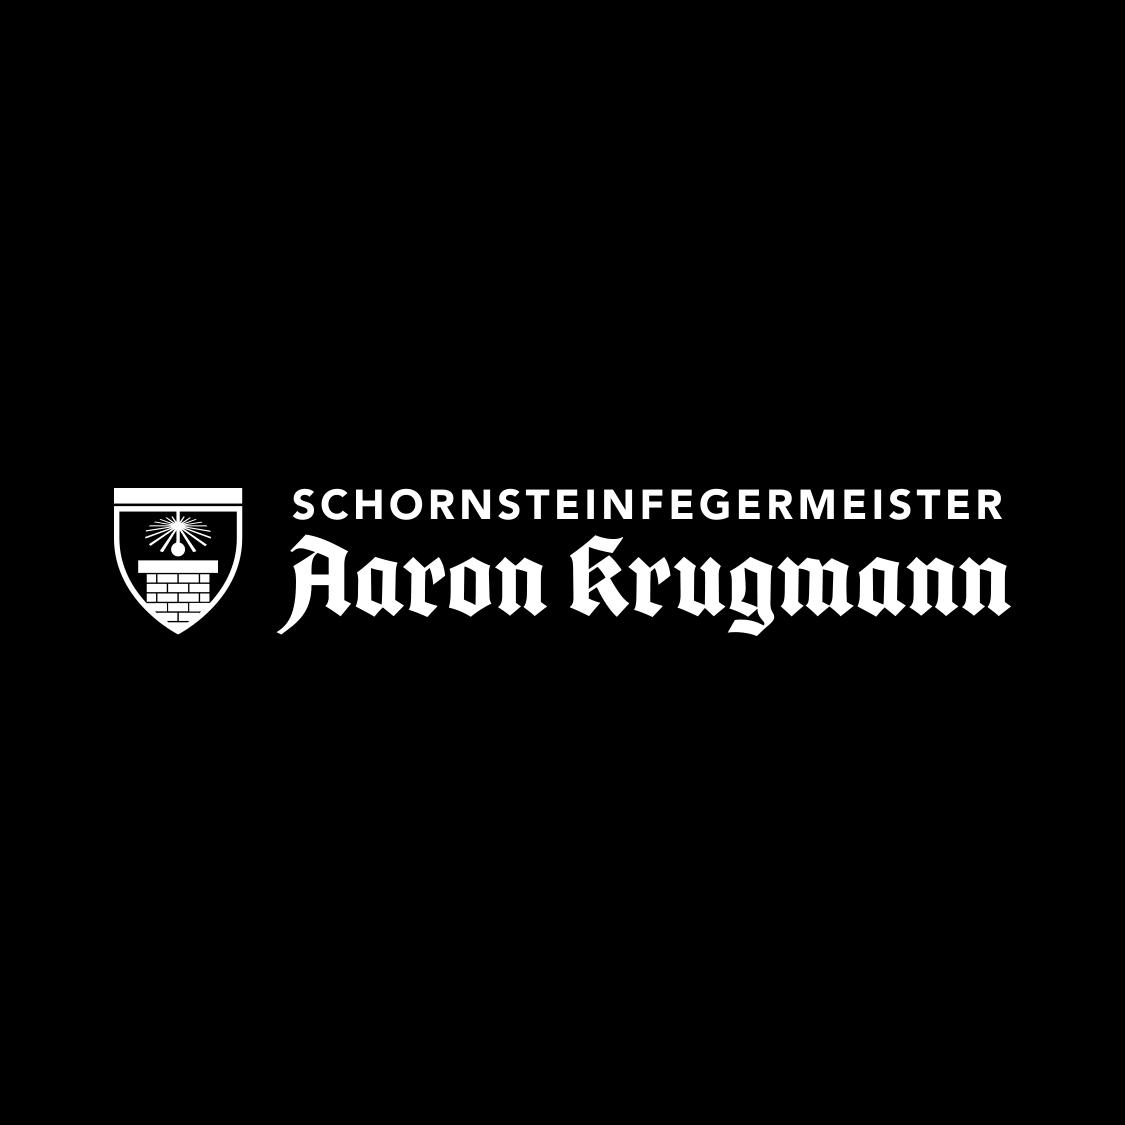 04 Logo Schornsteinfegermeister Aaron Krugmann negativ